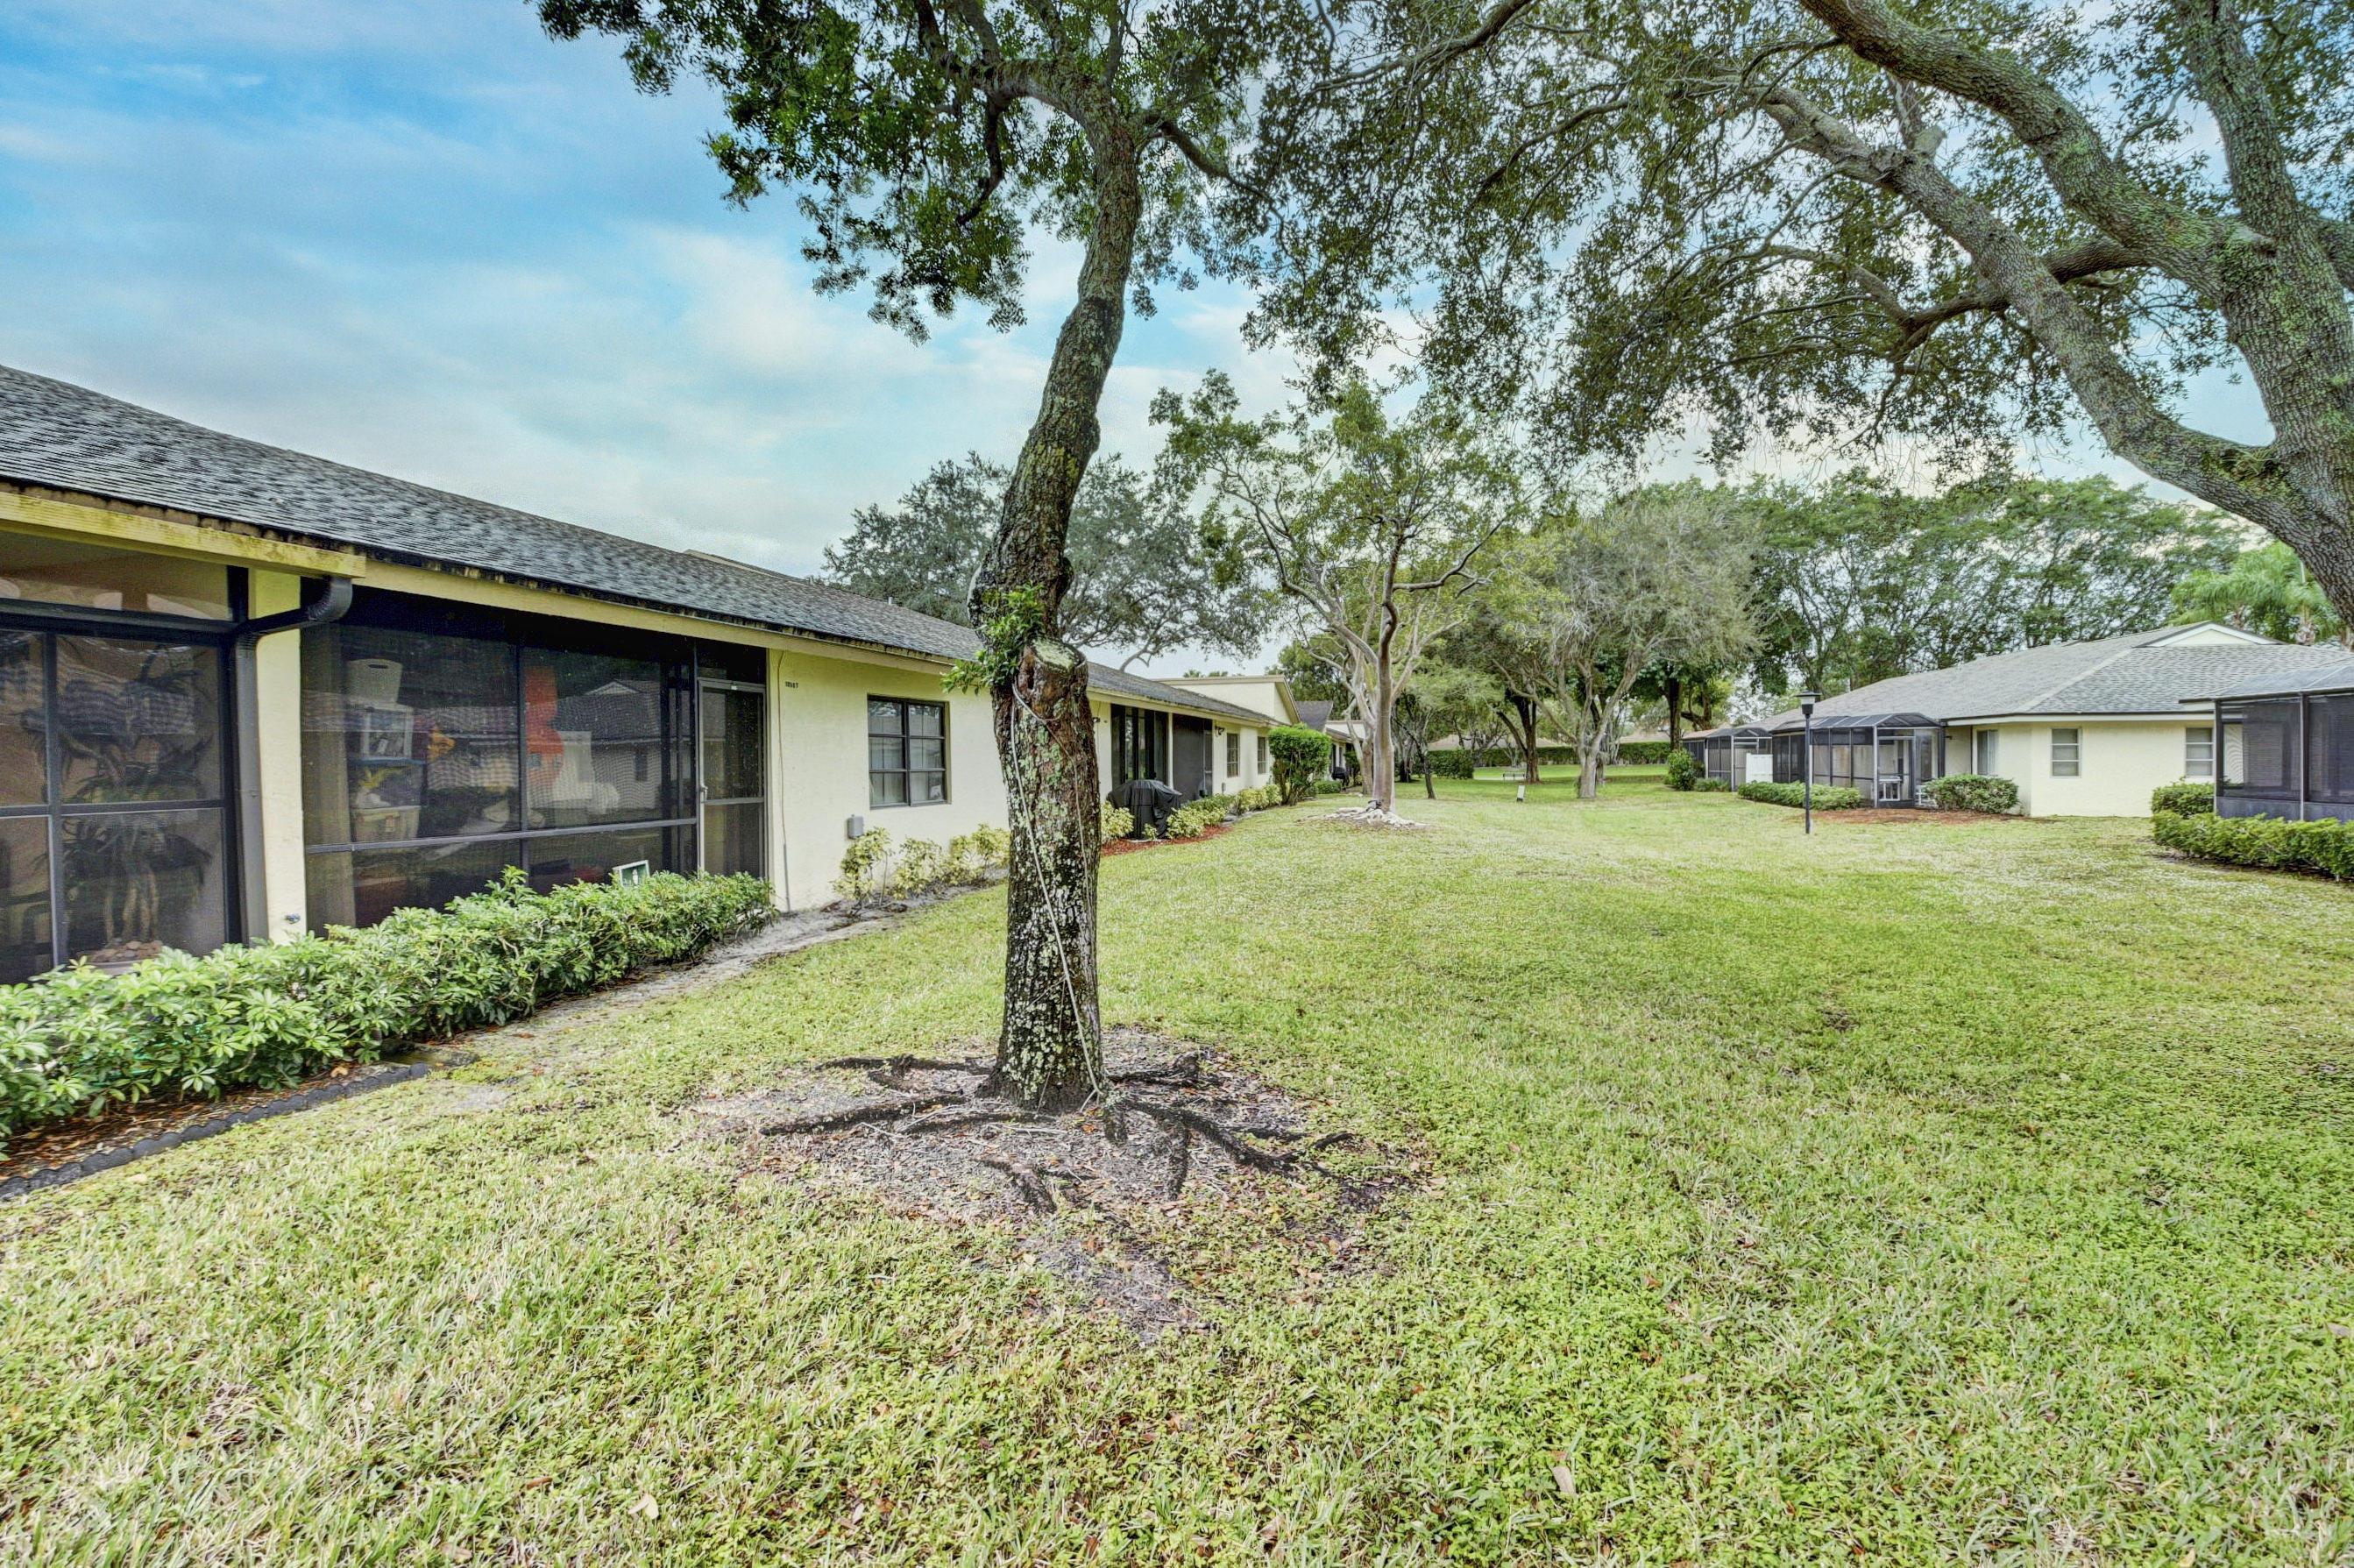 18583 Breezy Palm Way, Boca Raton, Florida 33496, 2 Bedrooms Bedrooms, ,2 BathroomsBathrooms,Residential,For Sale,Breezy Palm,RX-10586701